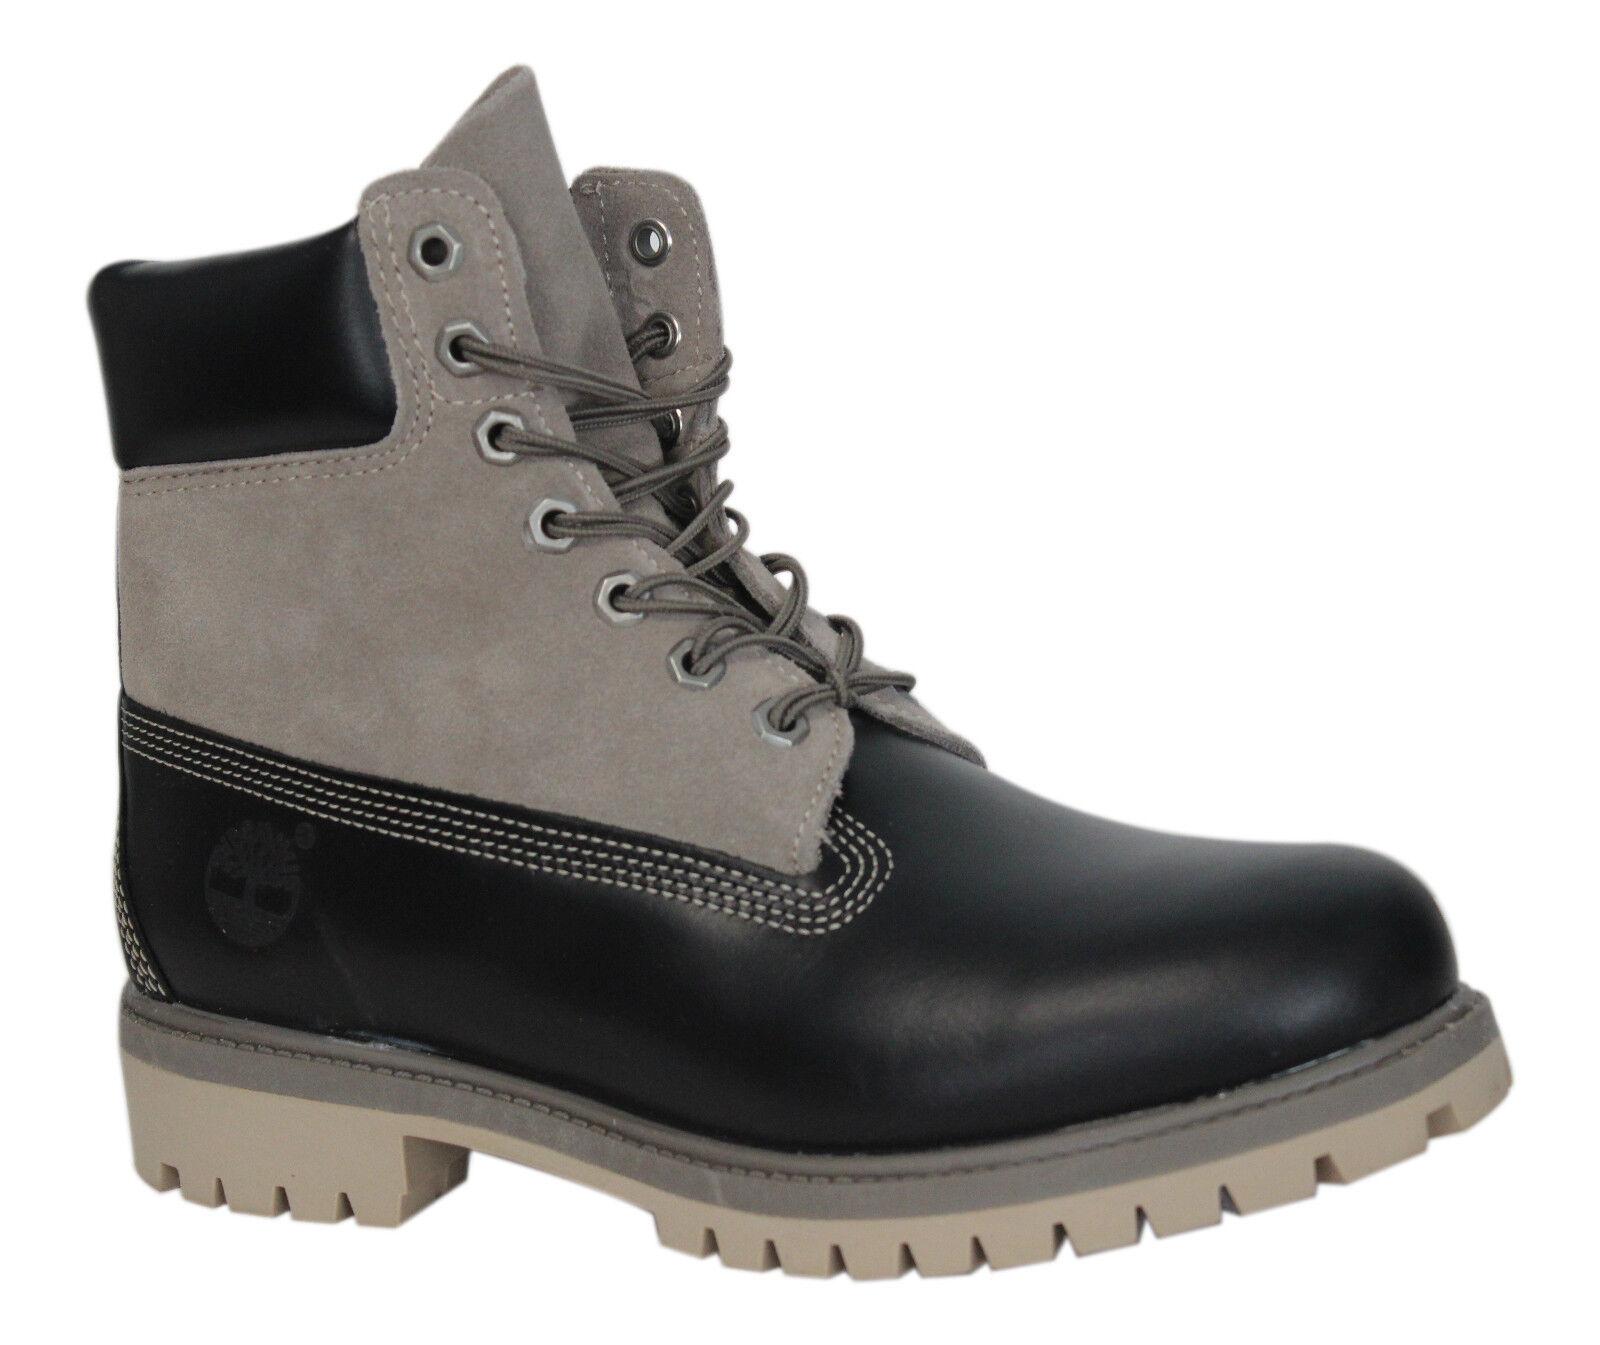 Emerica Reynolds 3 G6 Vulc Teal/Black 43 (10 EU (10 43 US / 9 UK) bcb2c3